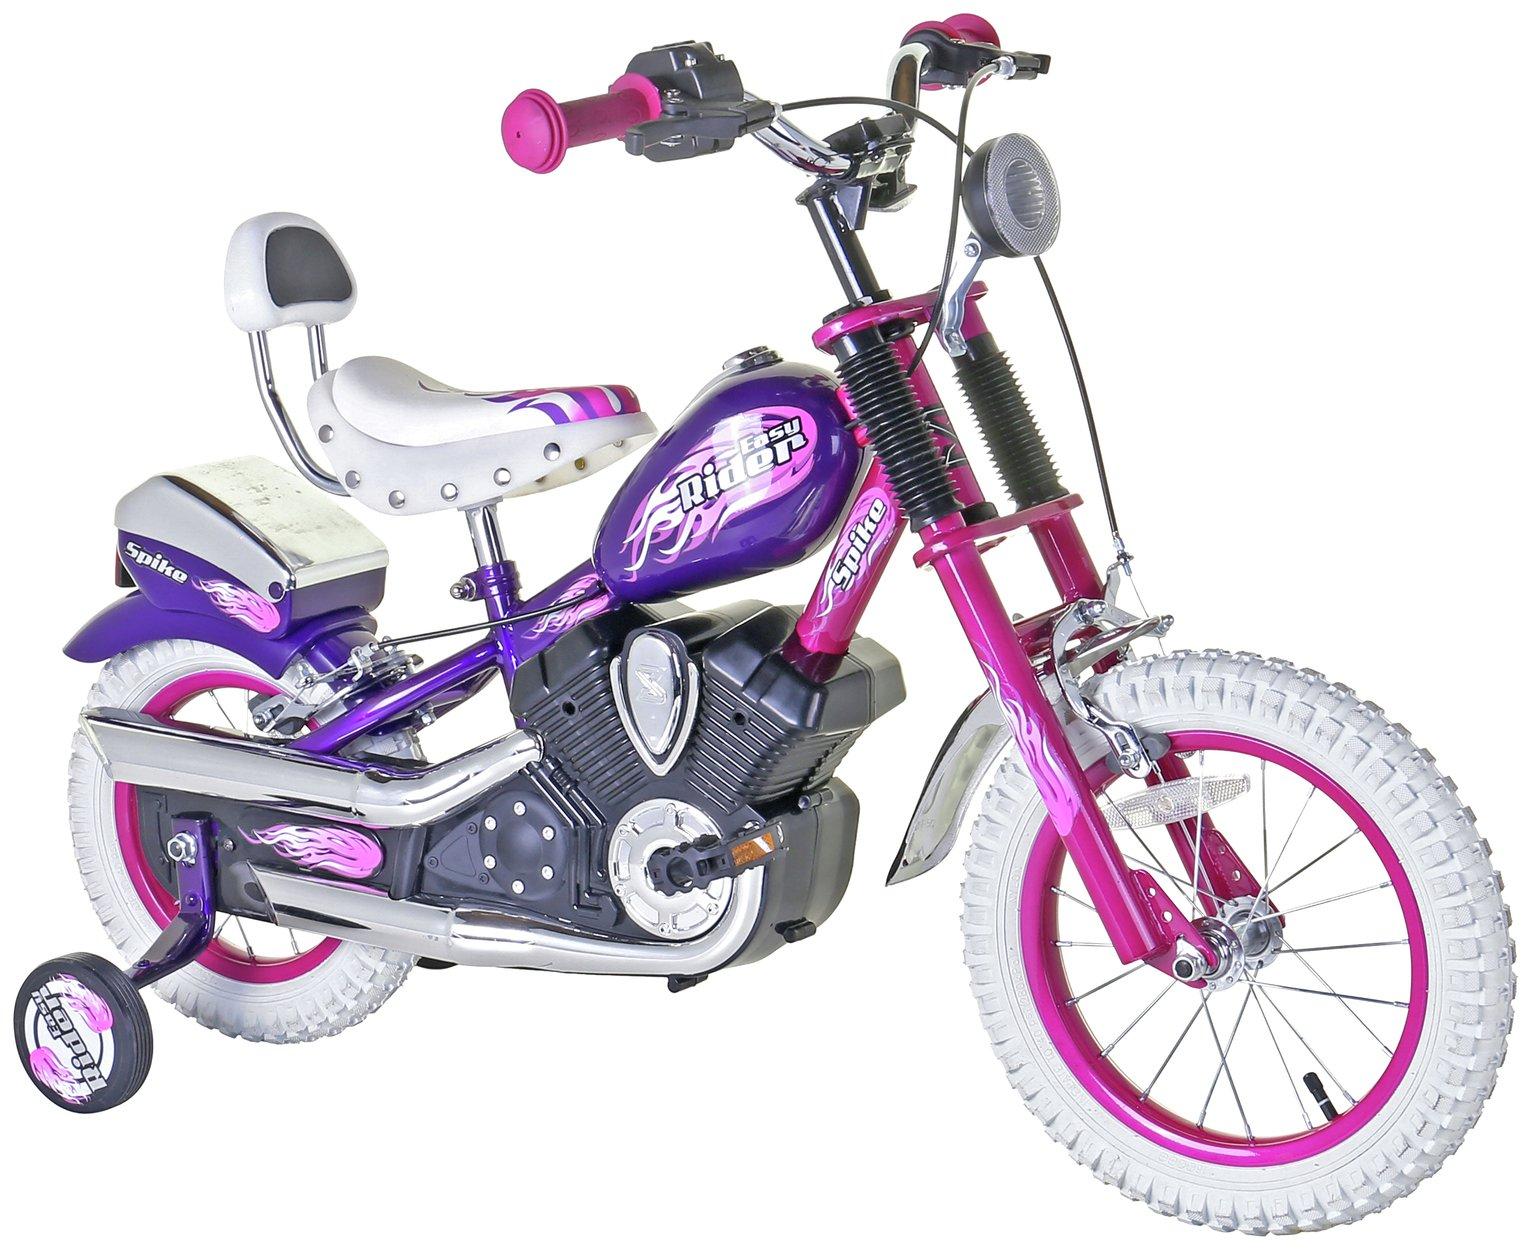 Spike Easy Rider 14 inch Wheel Size Chopper Kid's Bike